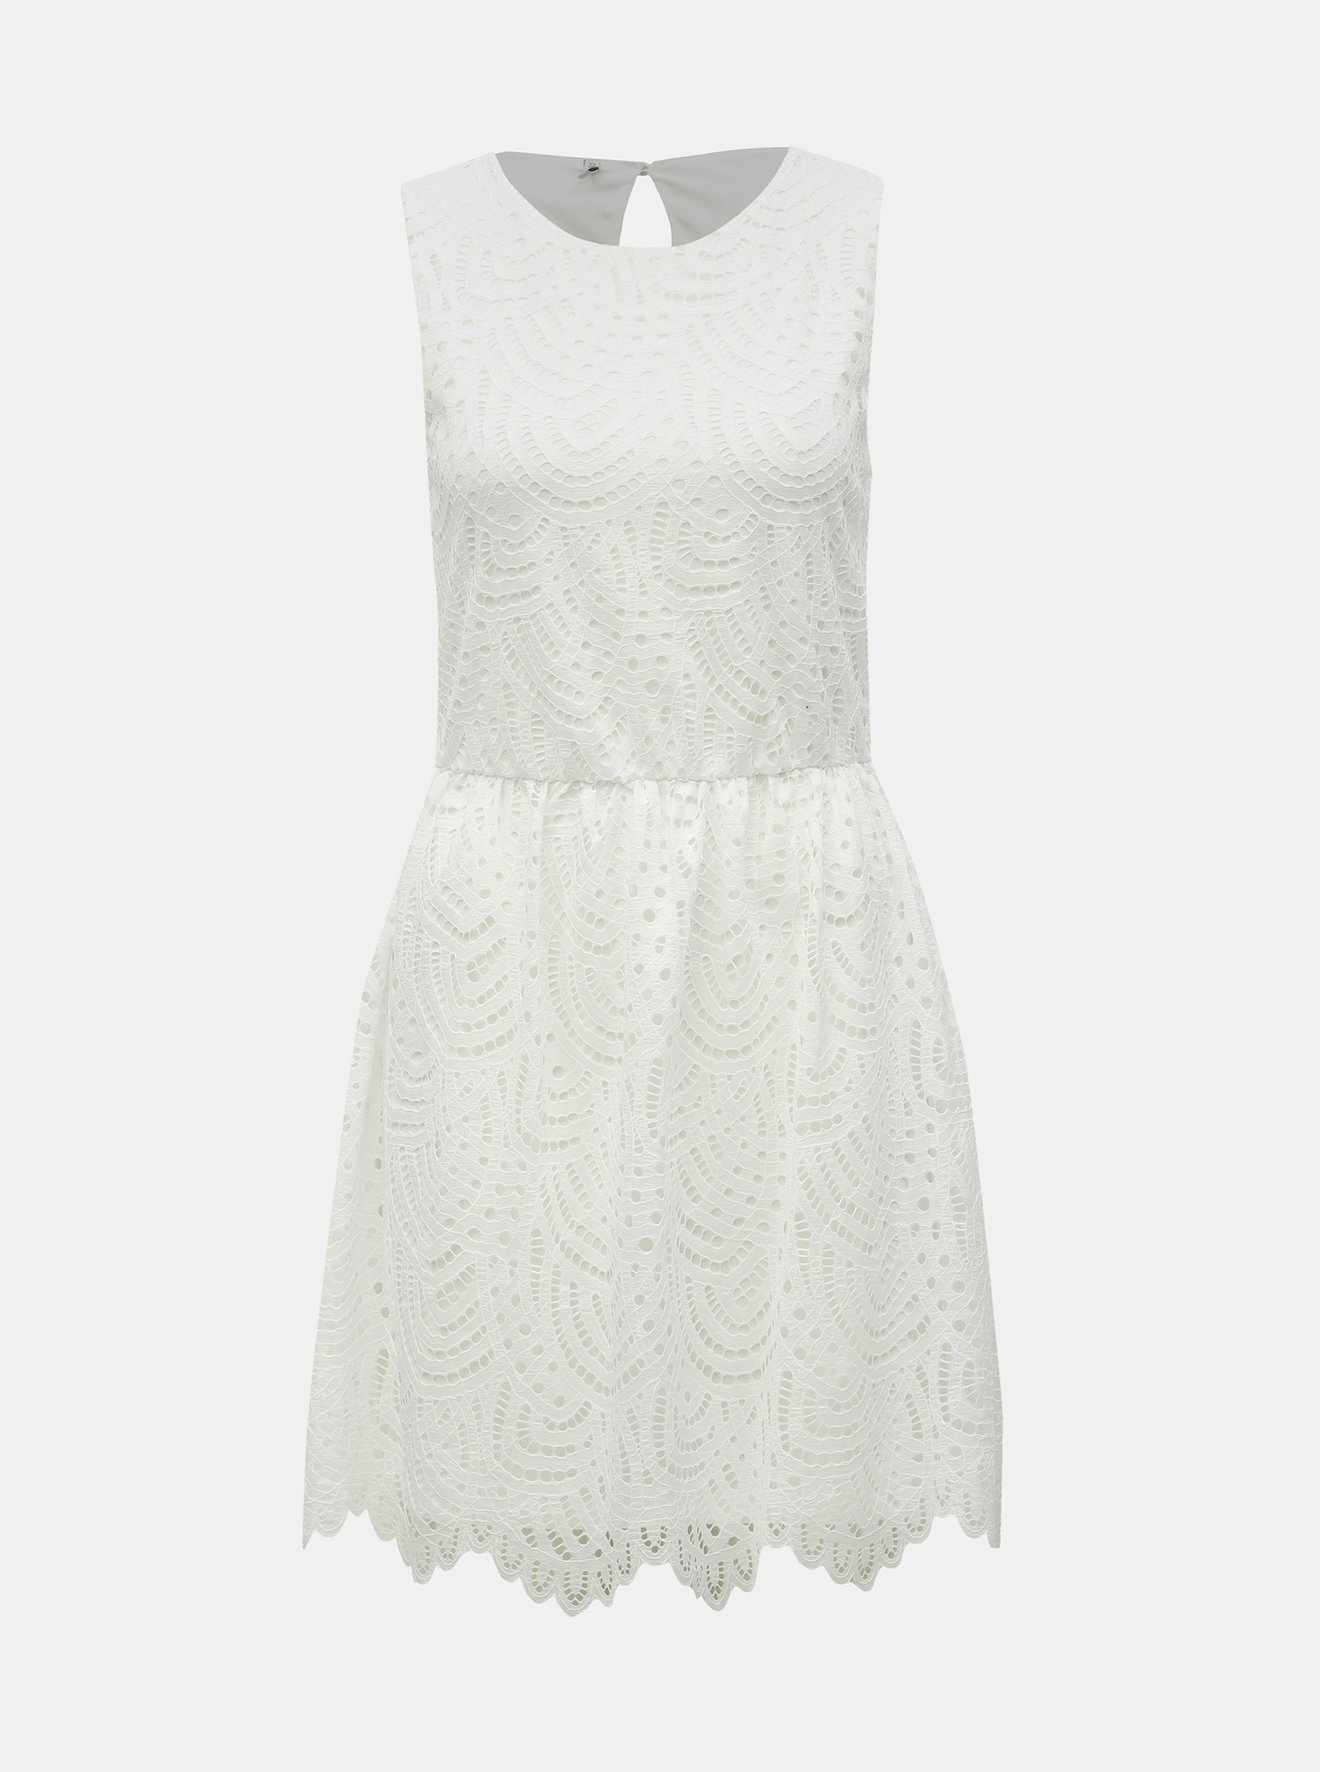 efed7c497bc2 Bílé krajkové šaty ONLY Edith - SLEVA!